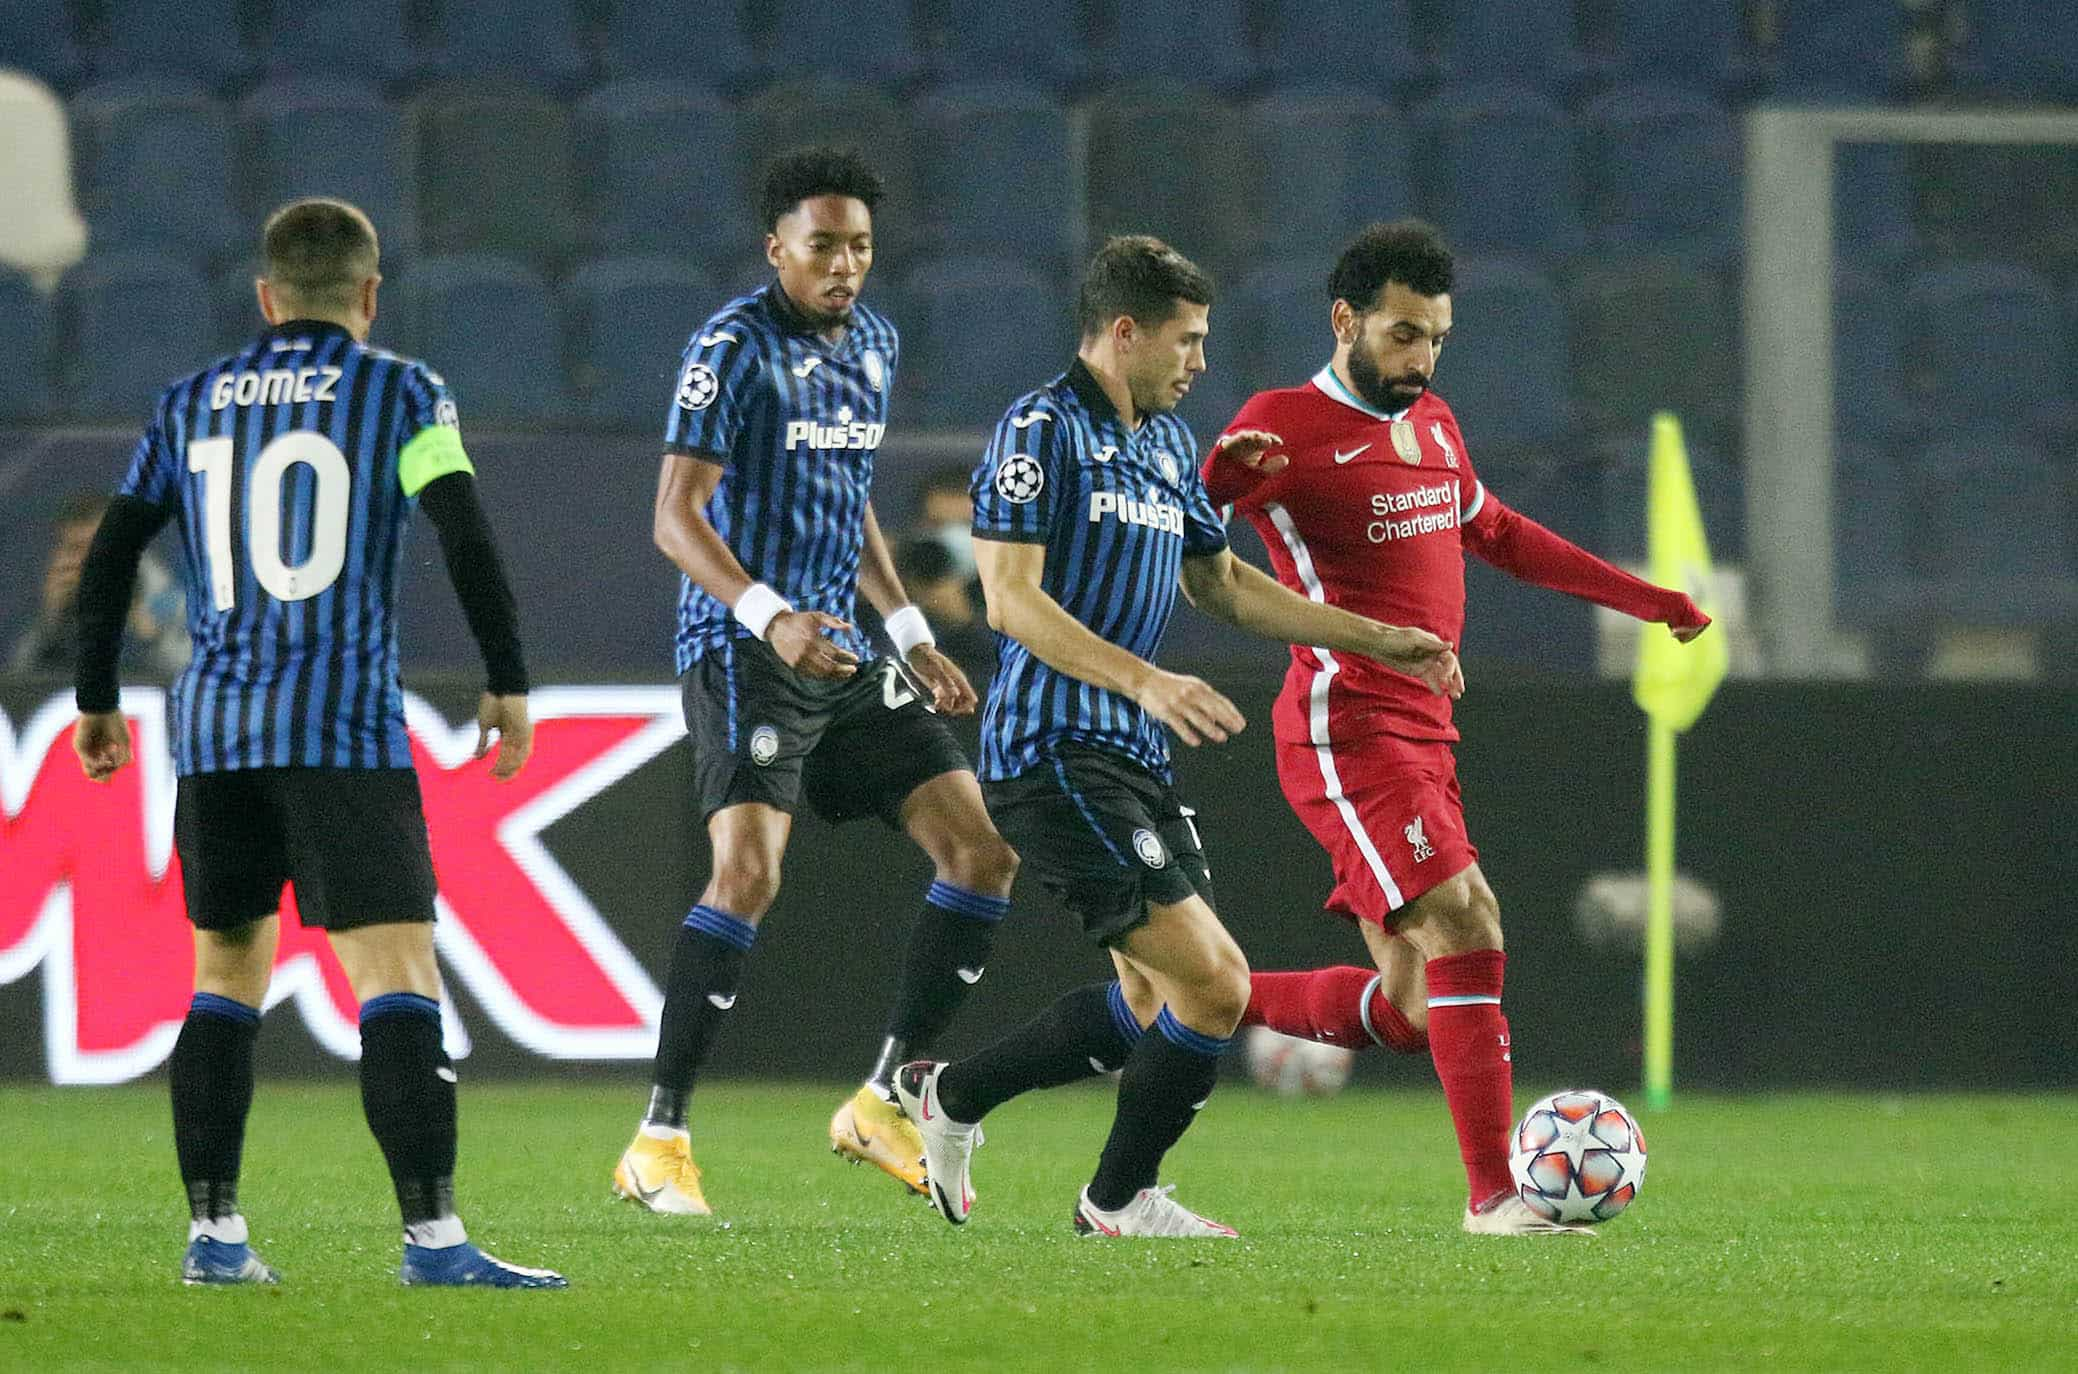 Liverpool - Atalanta